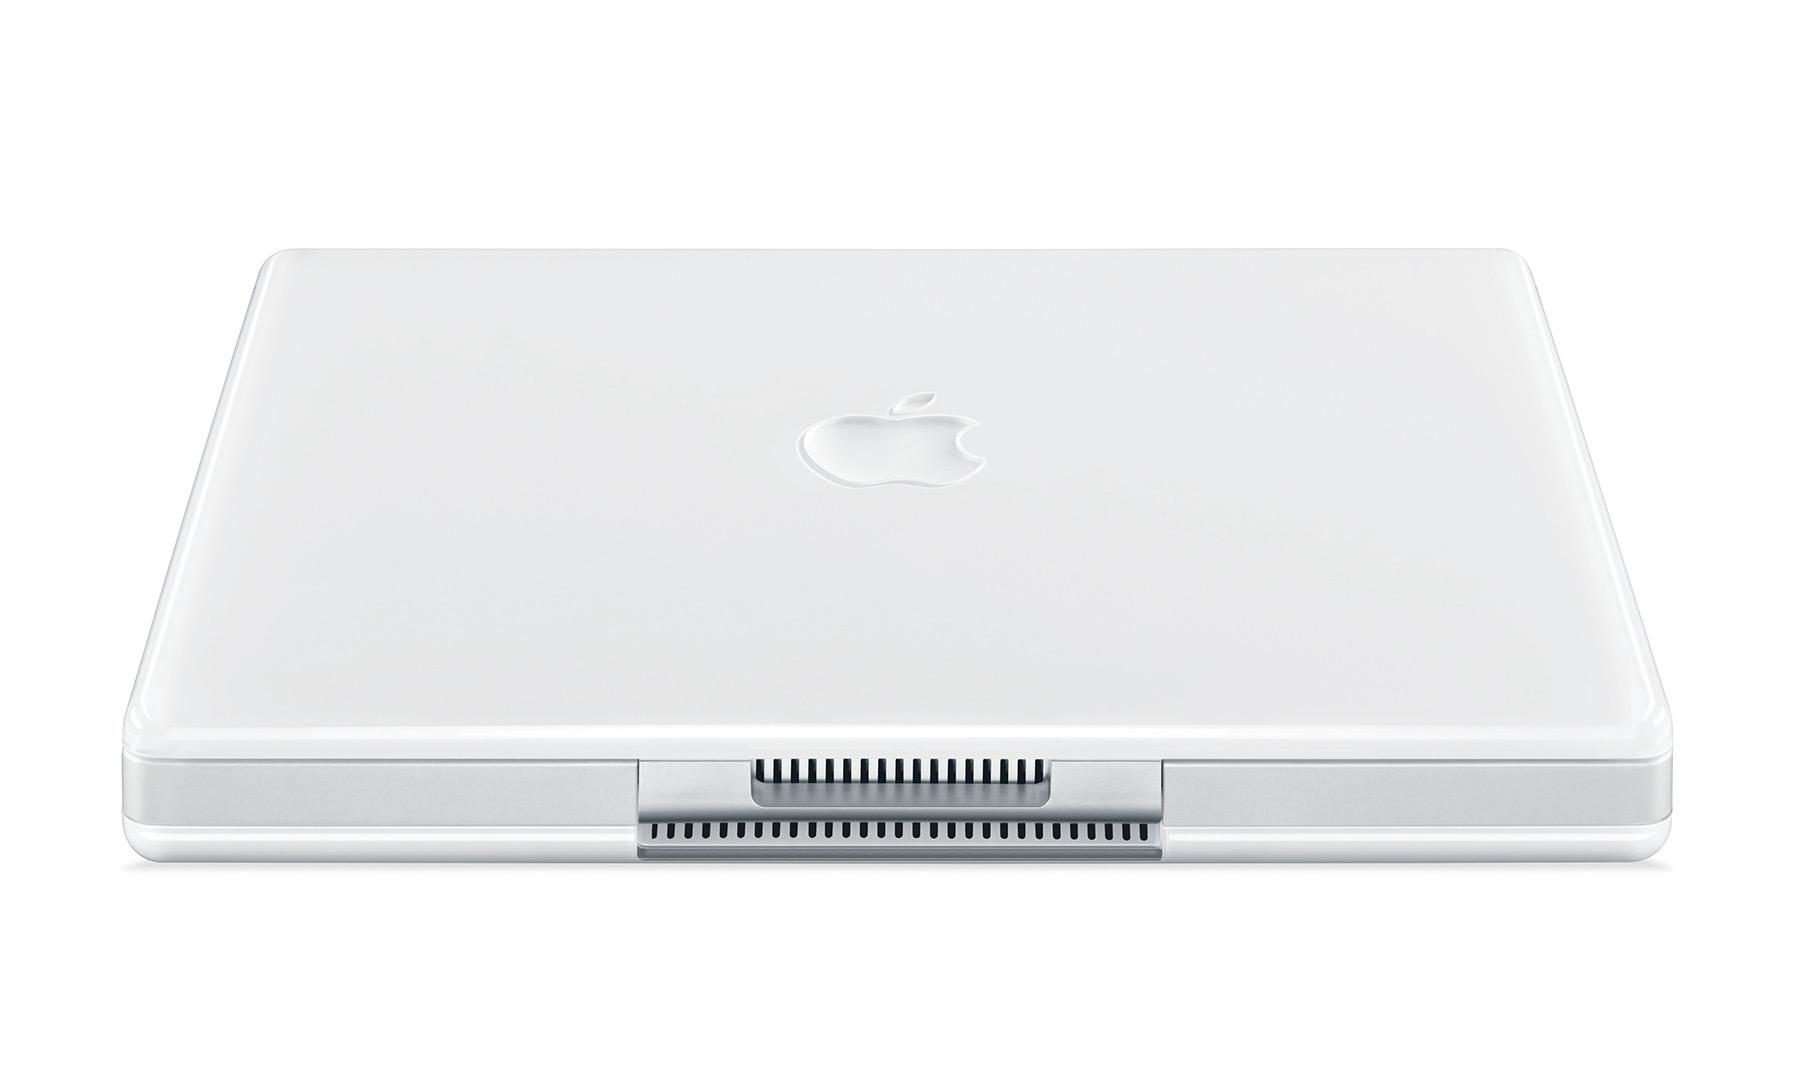 iBook G3 hinge